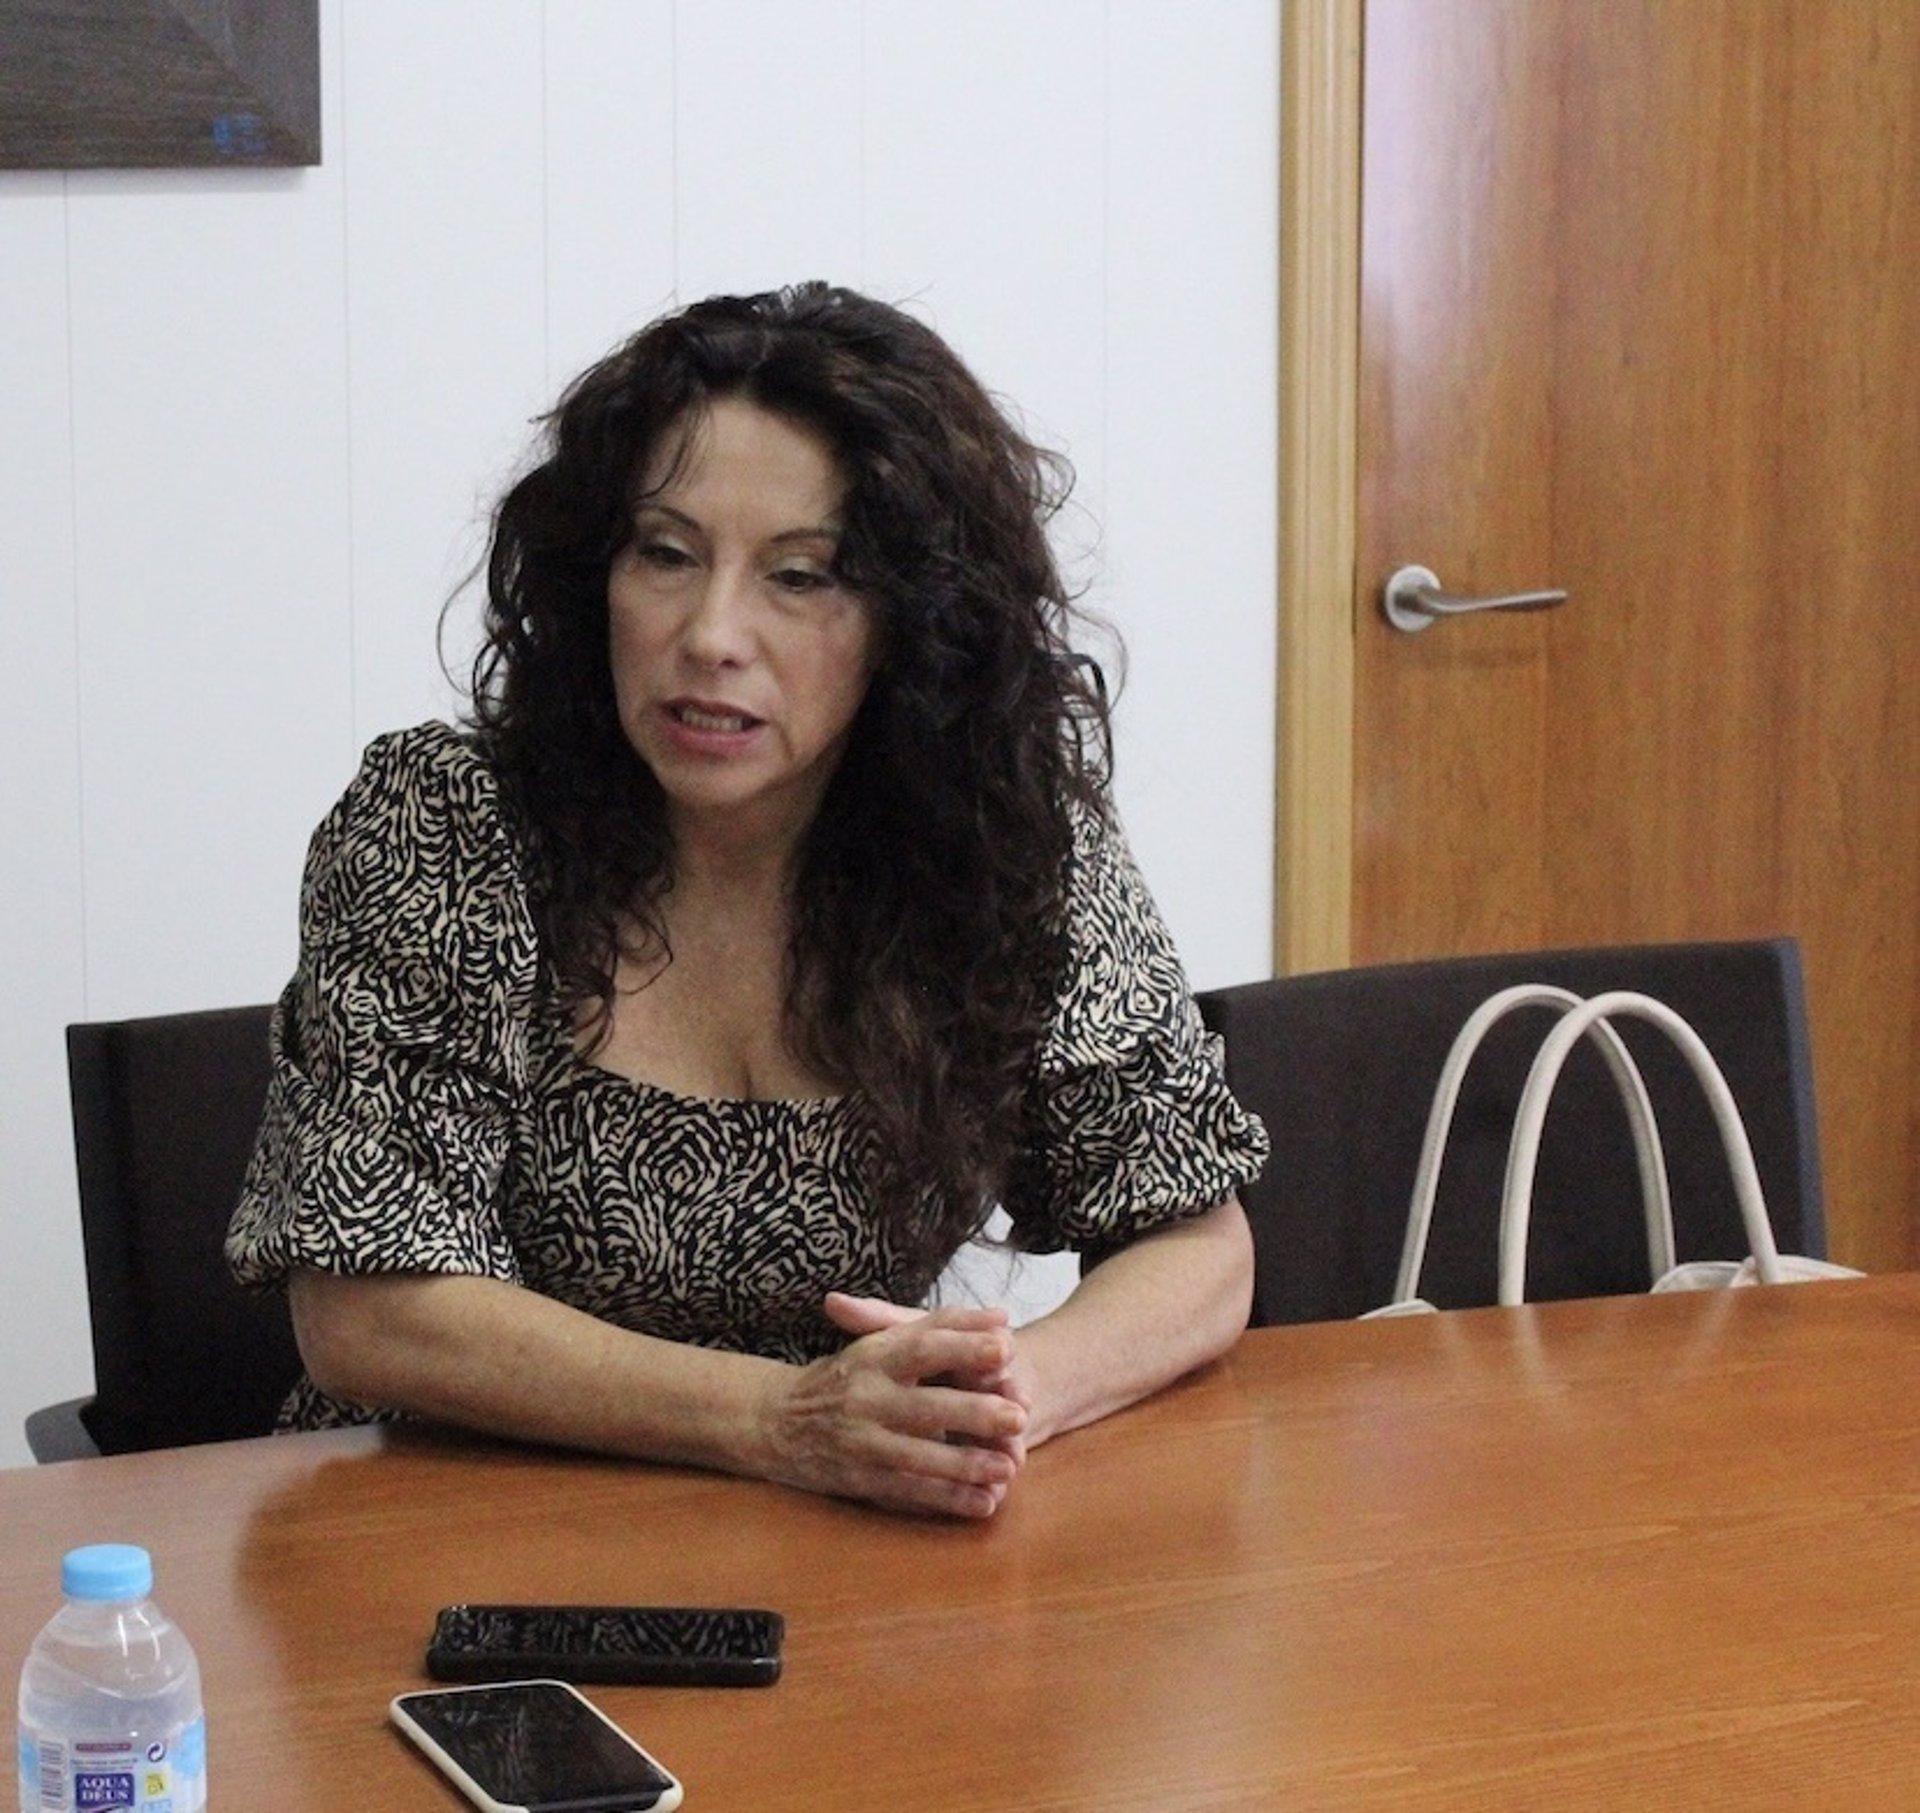 2.549 menores son atendidos en acogimiento familiar en Andalucía